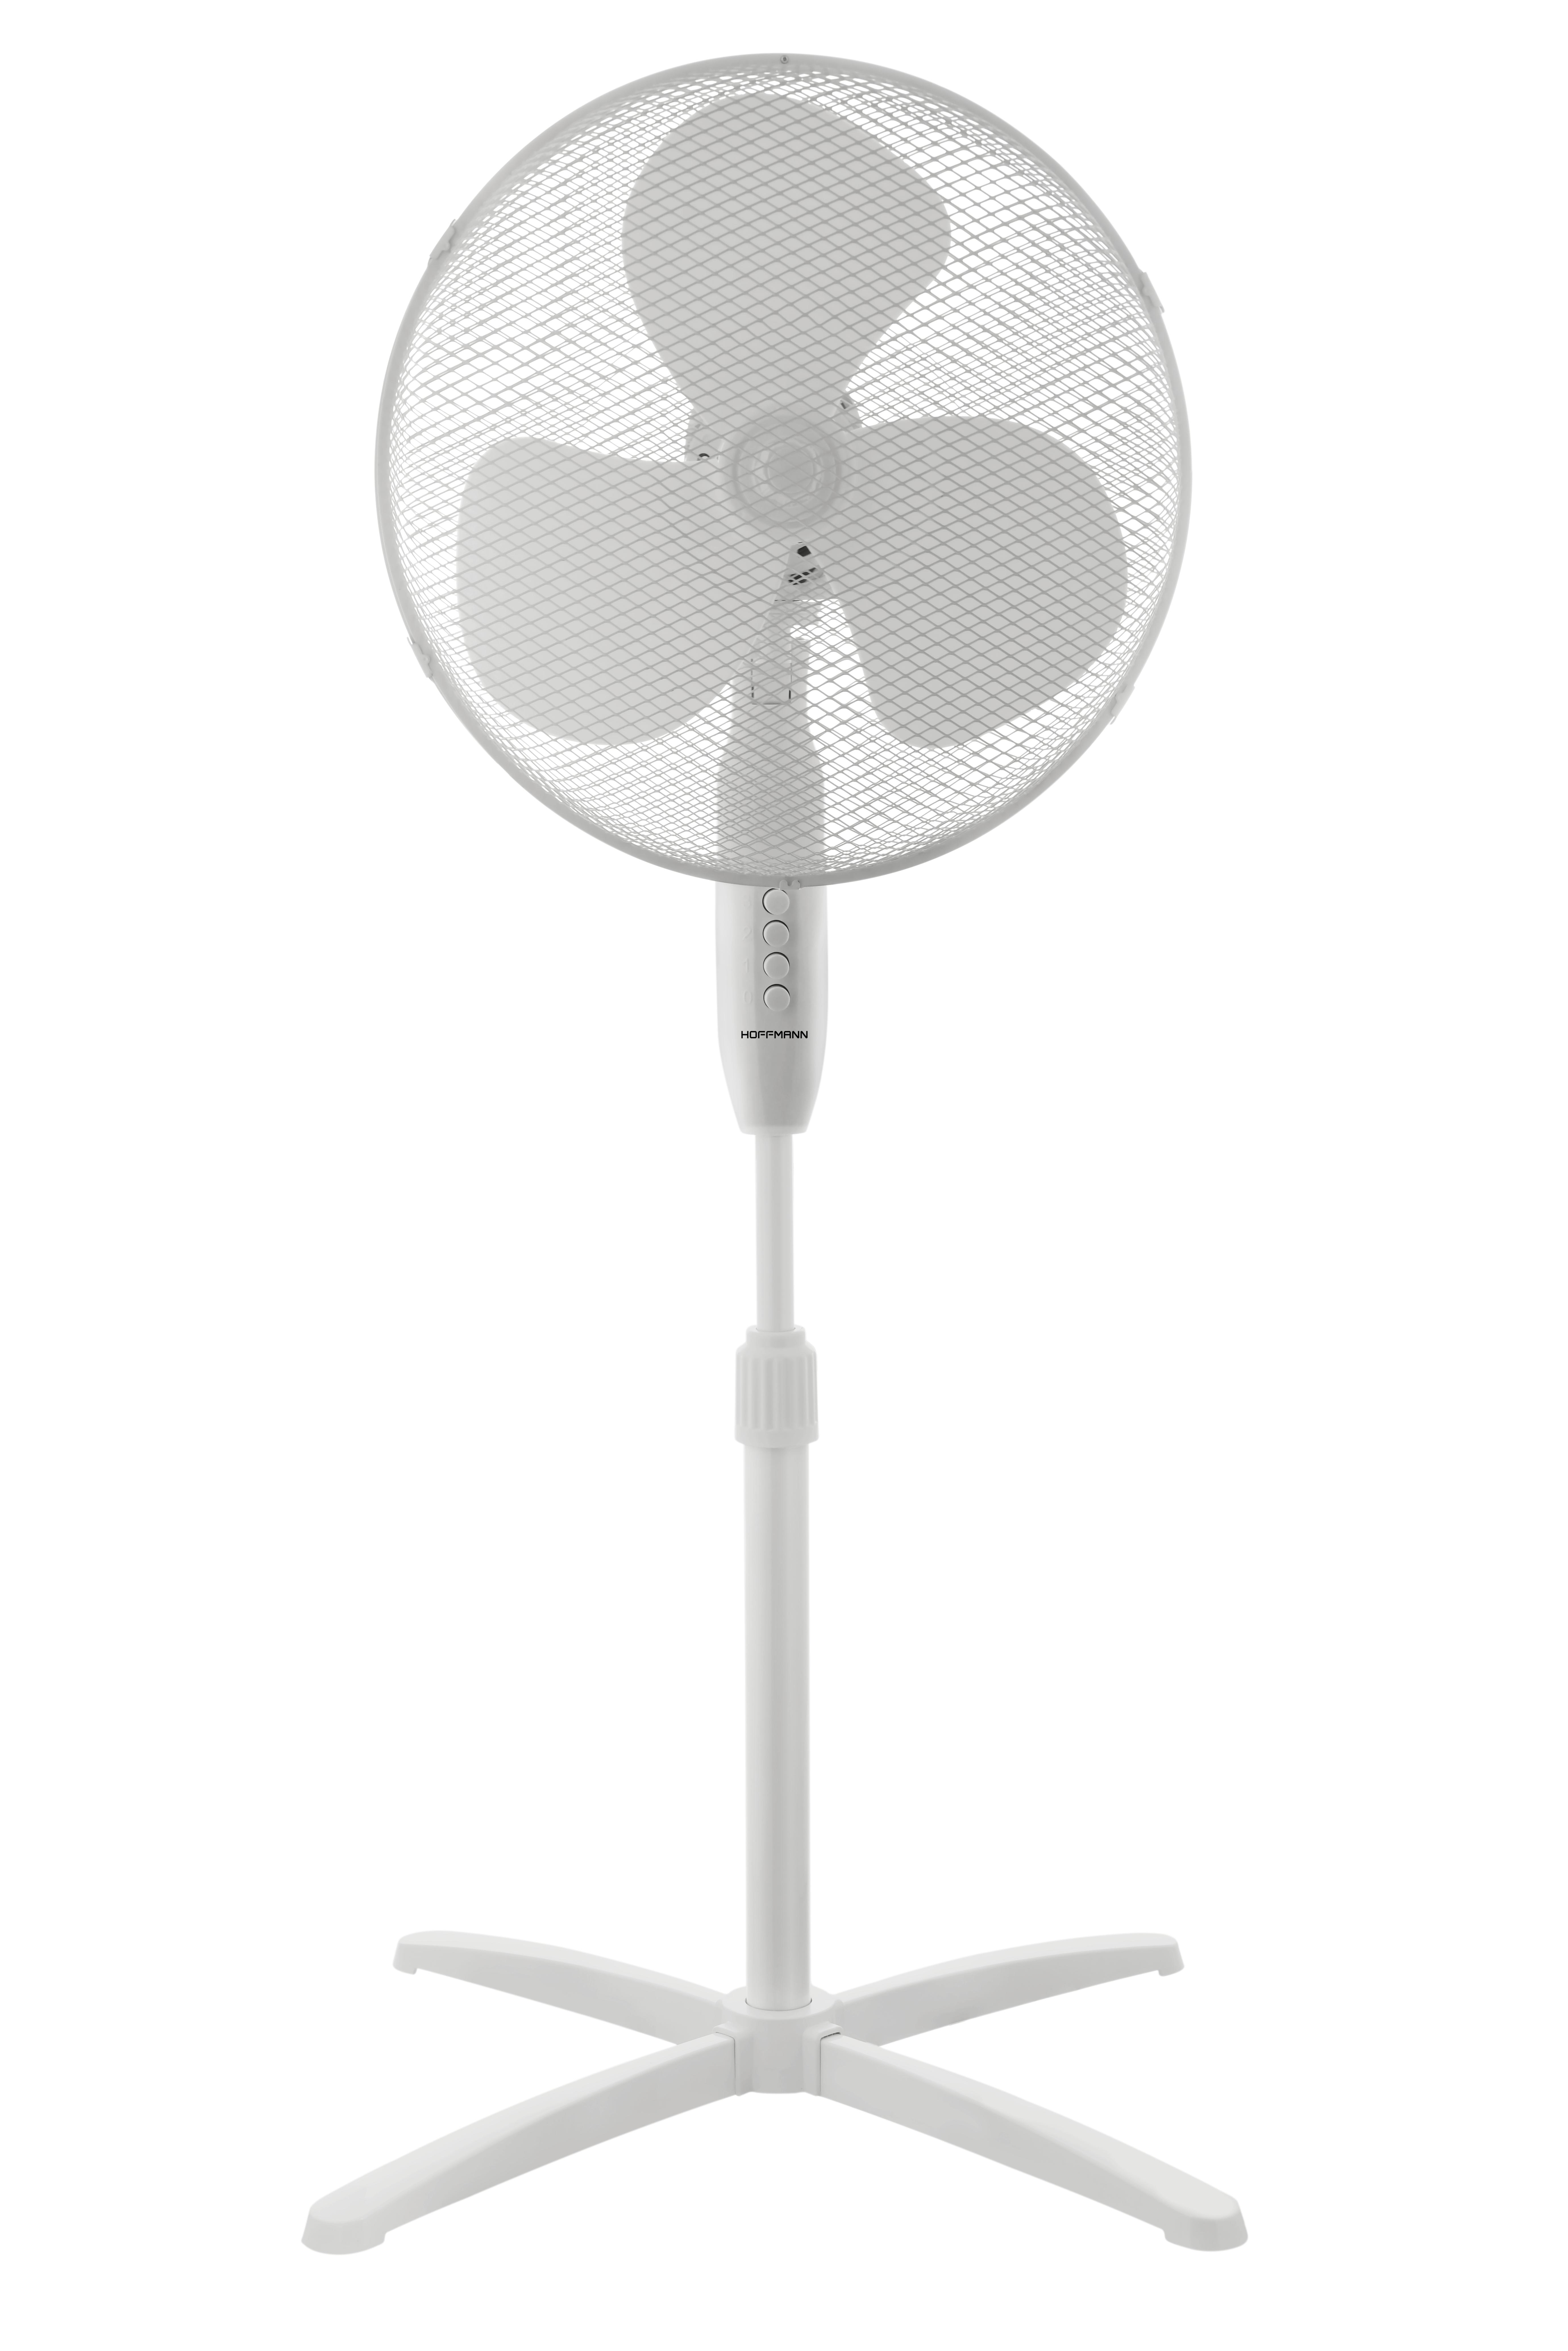 Ventilyator HOFFMANN SMP-125W  - 1